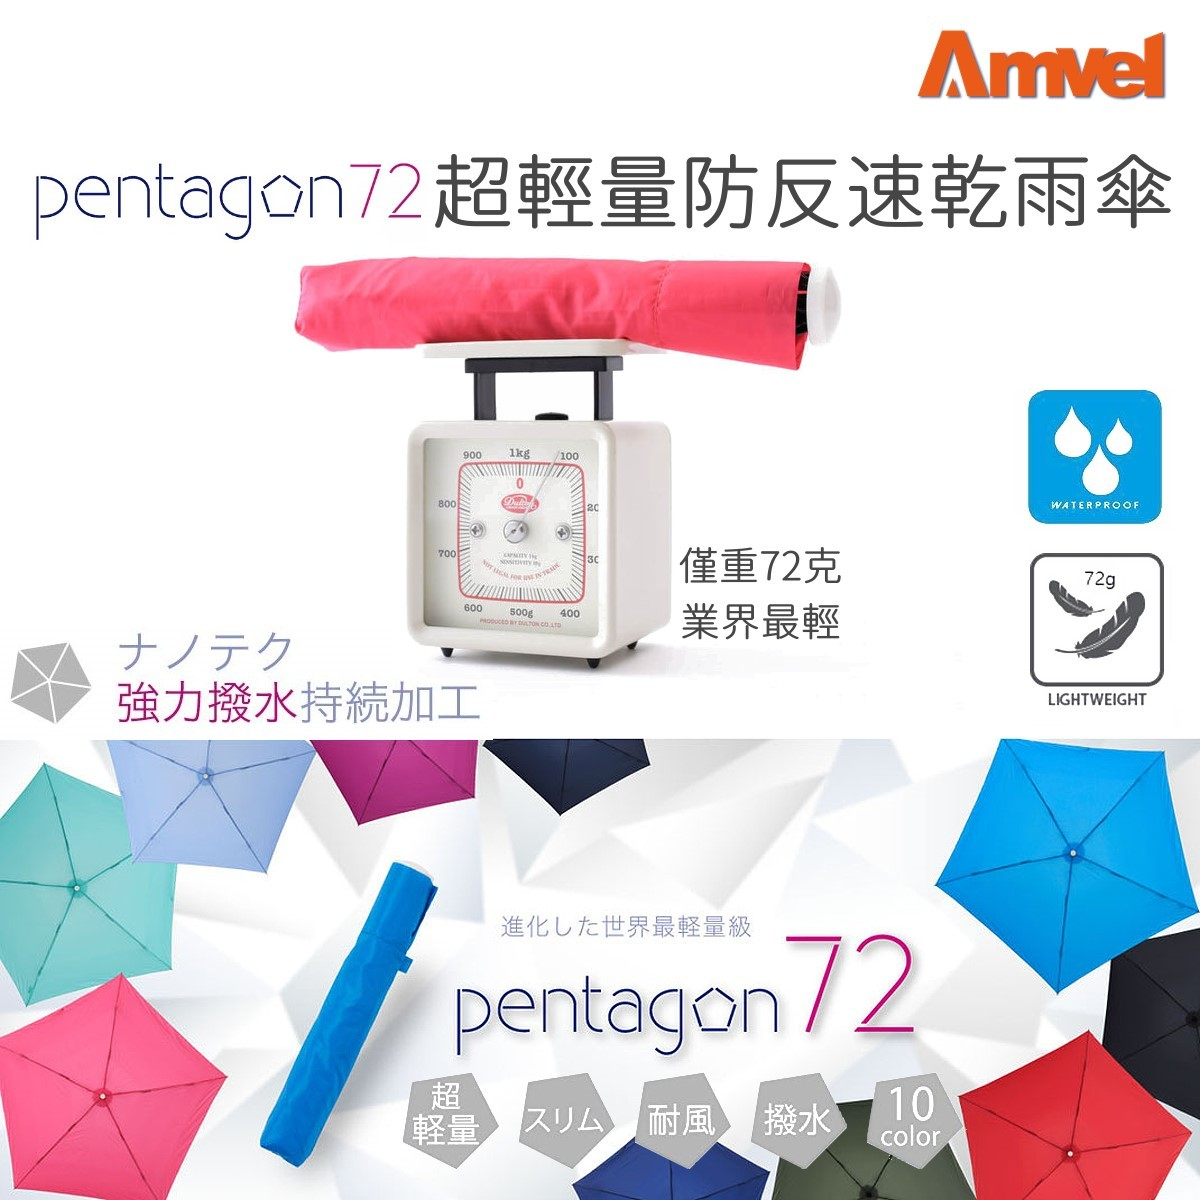 Pentagon72 日本超輕量防反速乾雨傘 - 黑色(Black) A1551